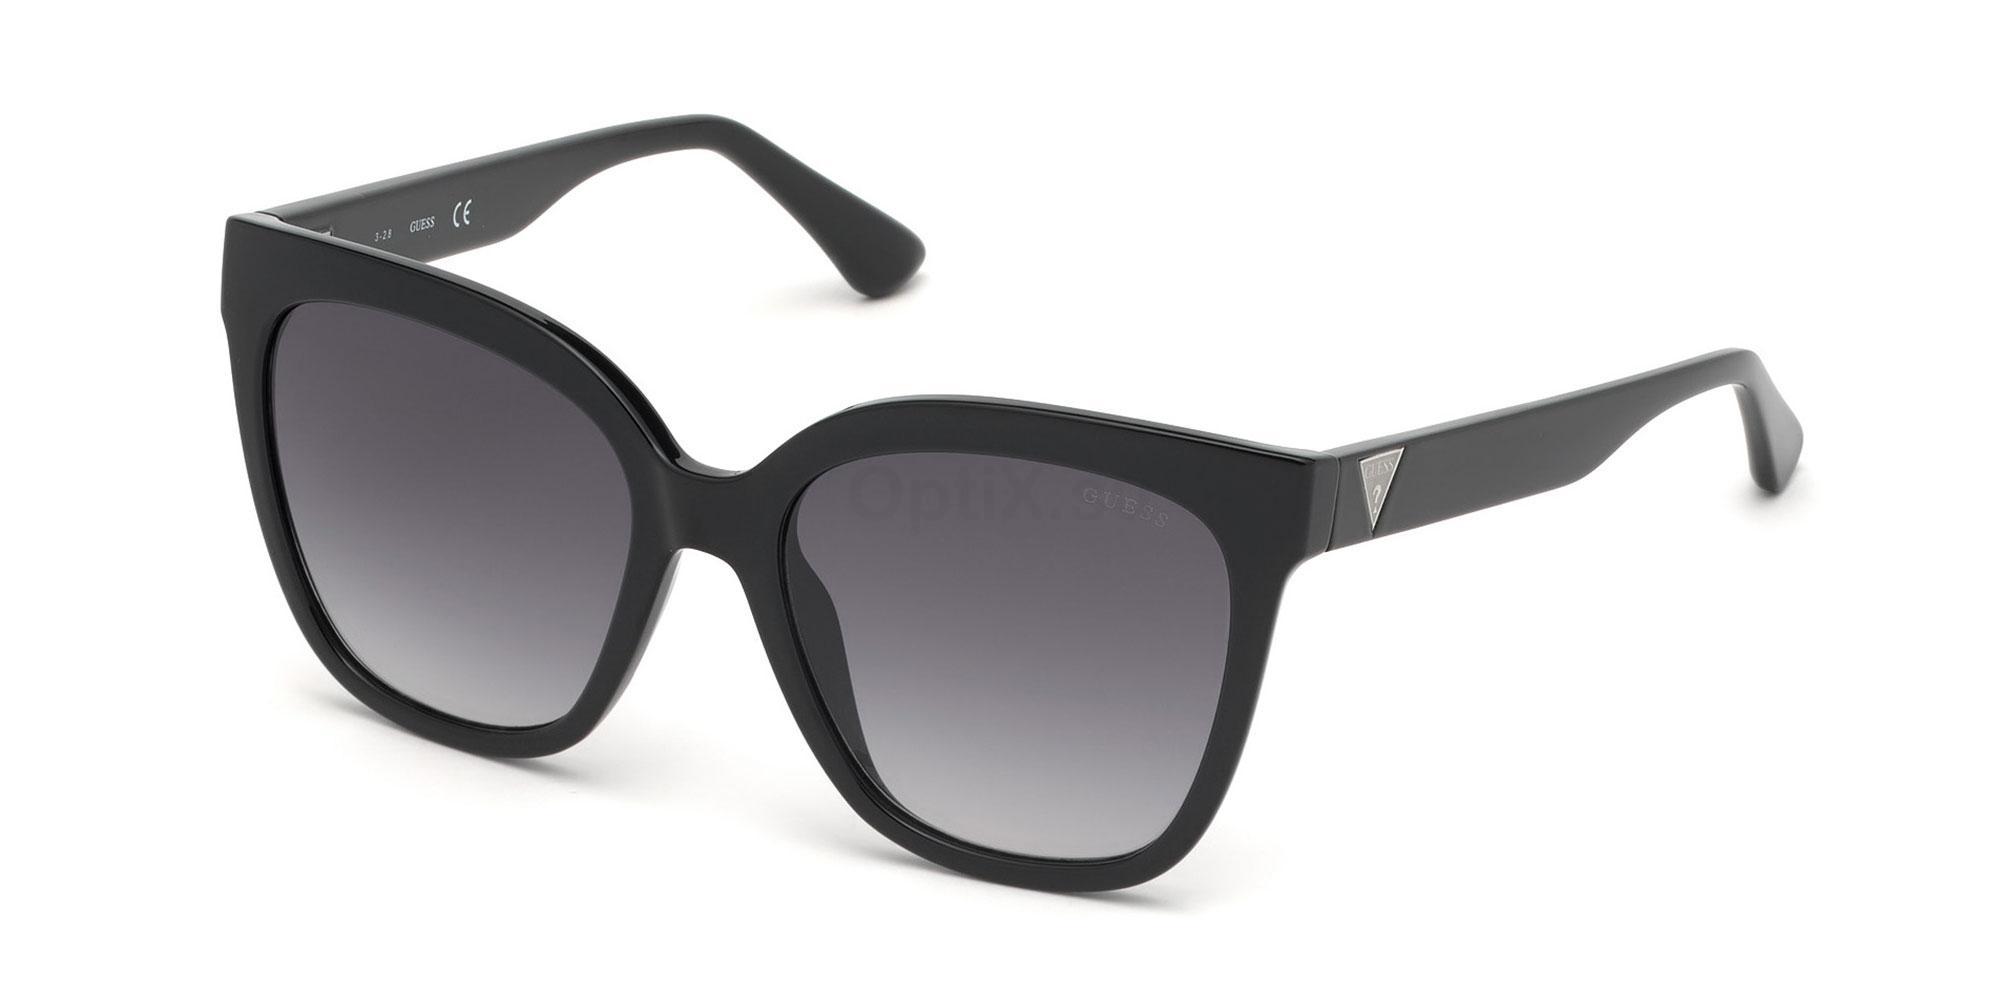 01B GU7612 Sunglasses, Guess